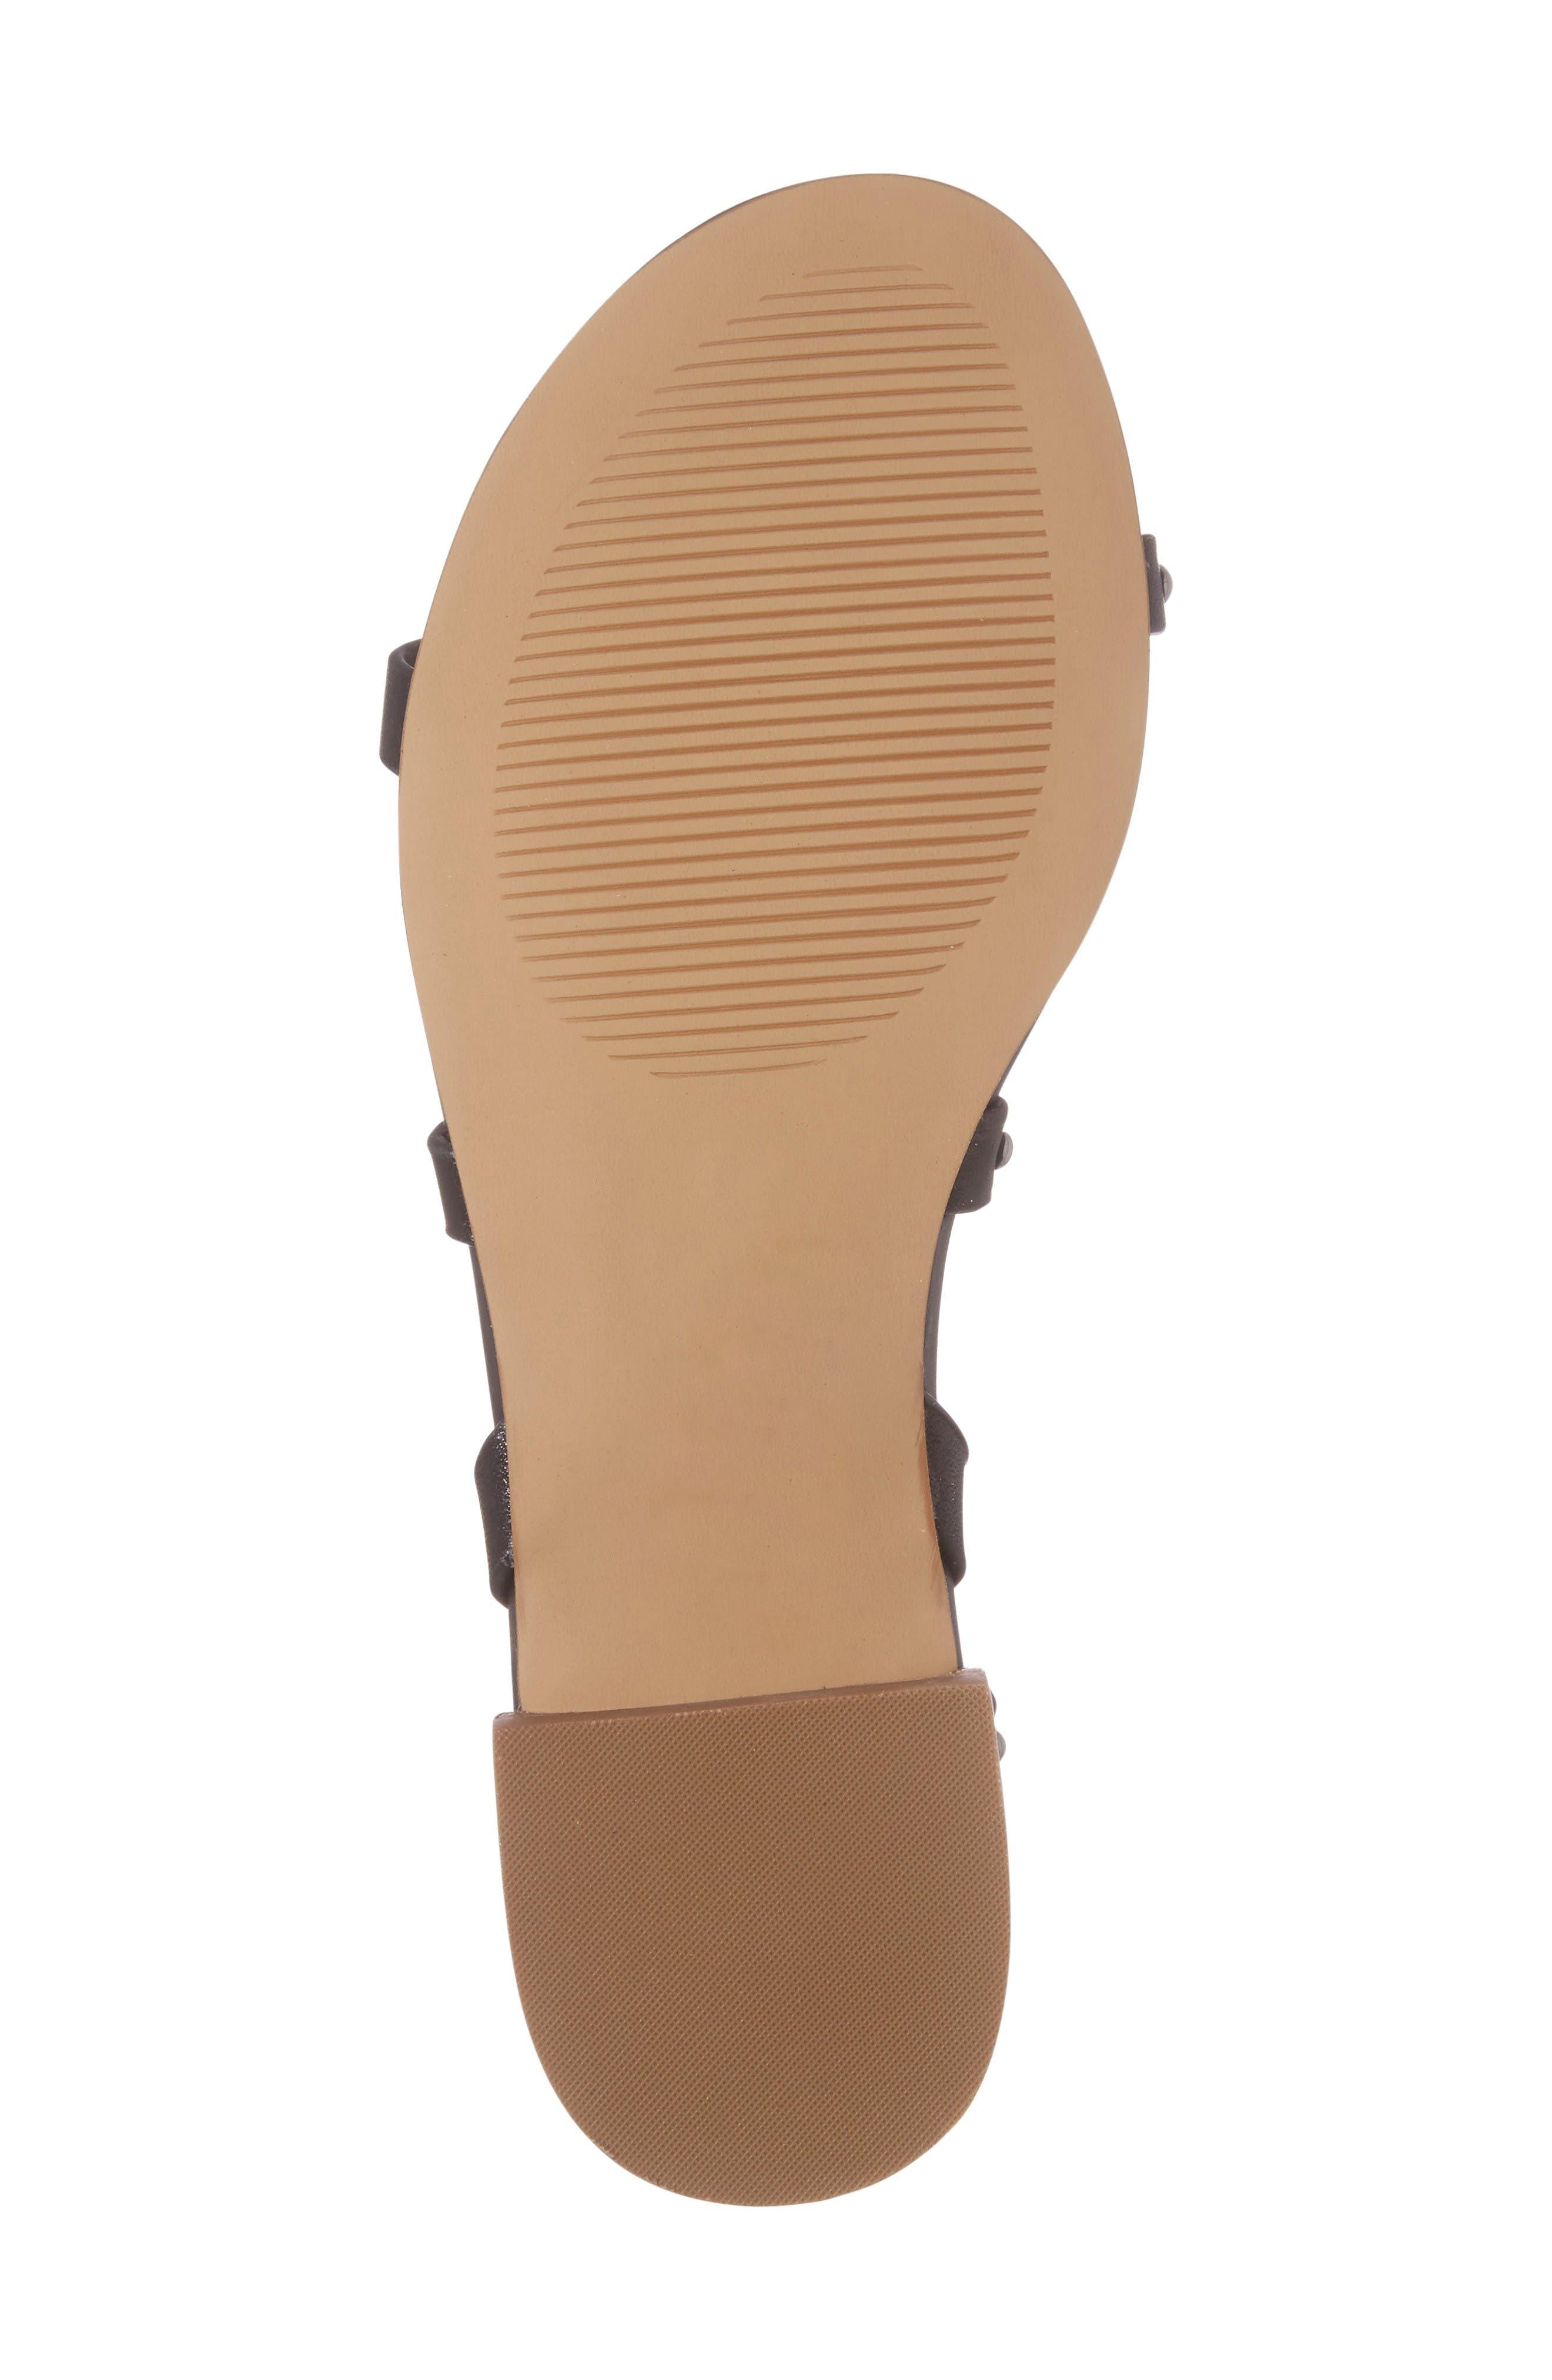 Celine Sandal,                             Alternate thumbnail 6, color,                             Black Leather